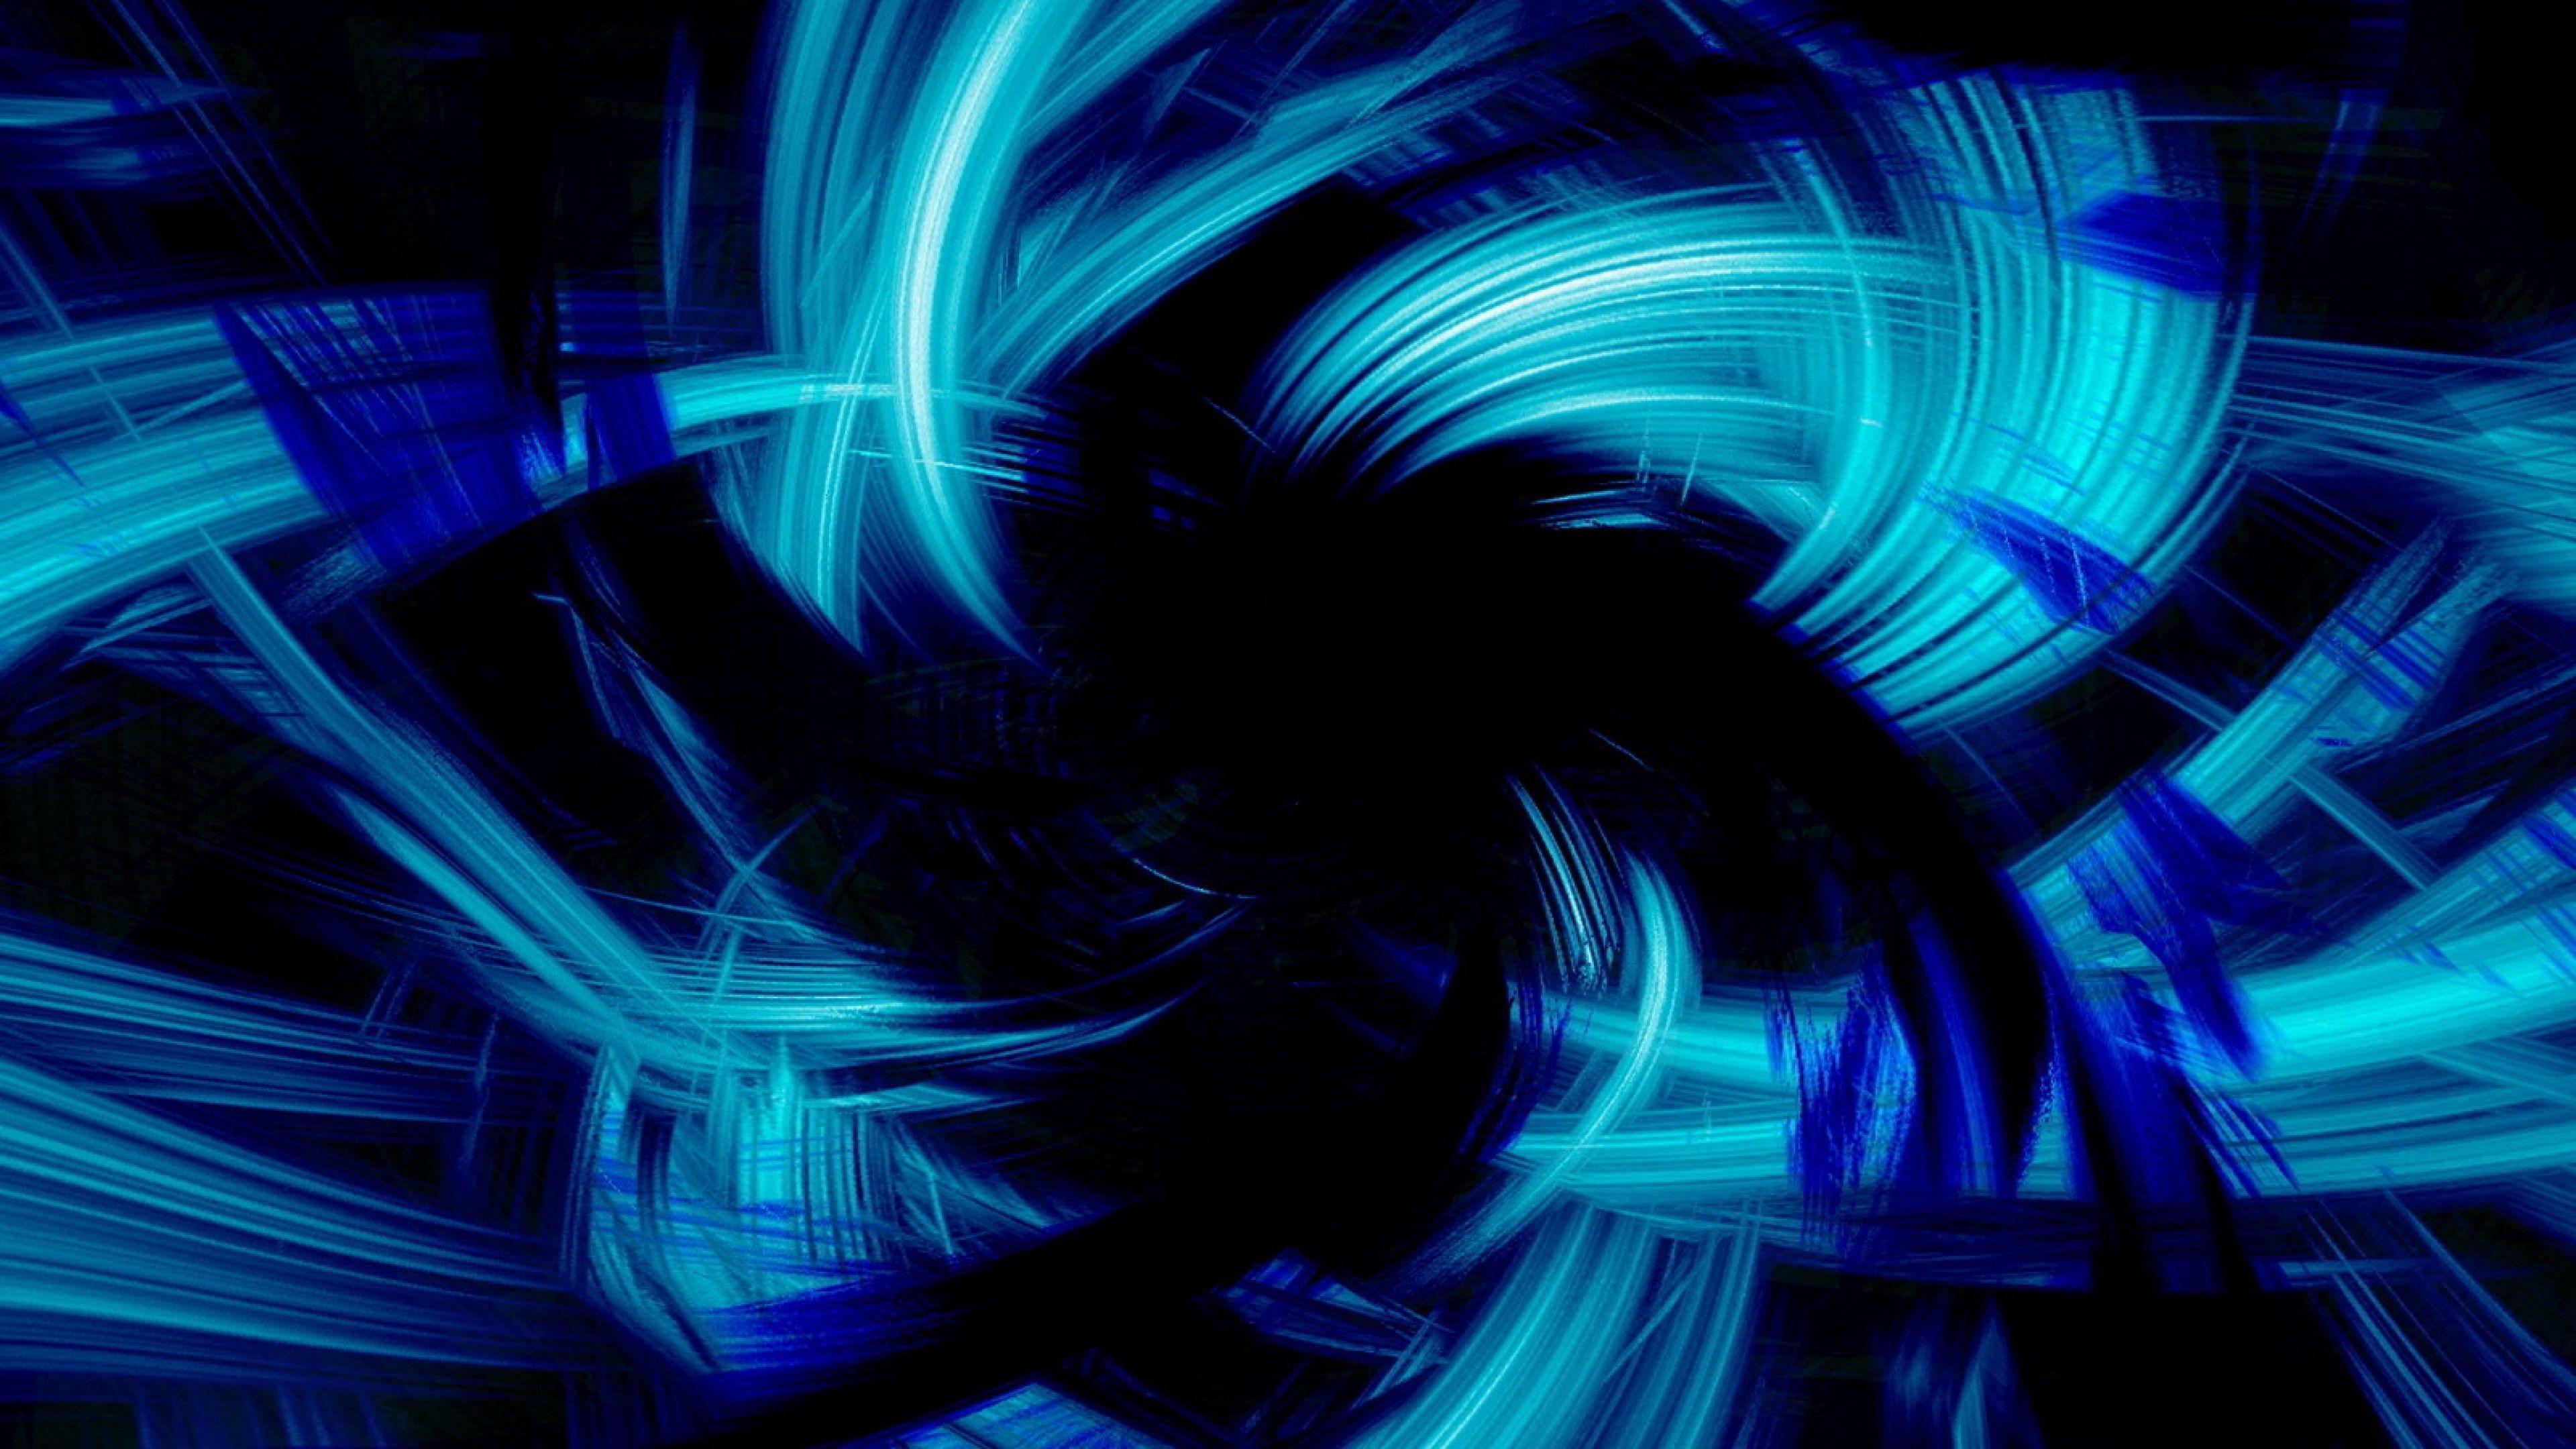 3840x2160 Hình nền Neon 4k Group Picture